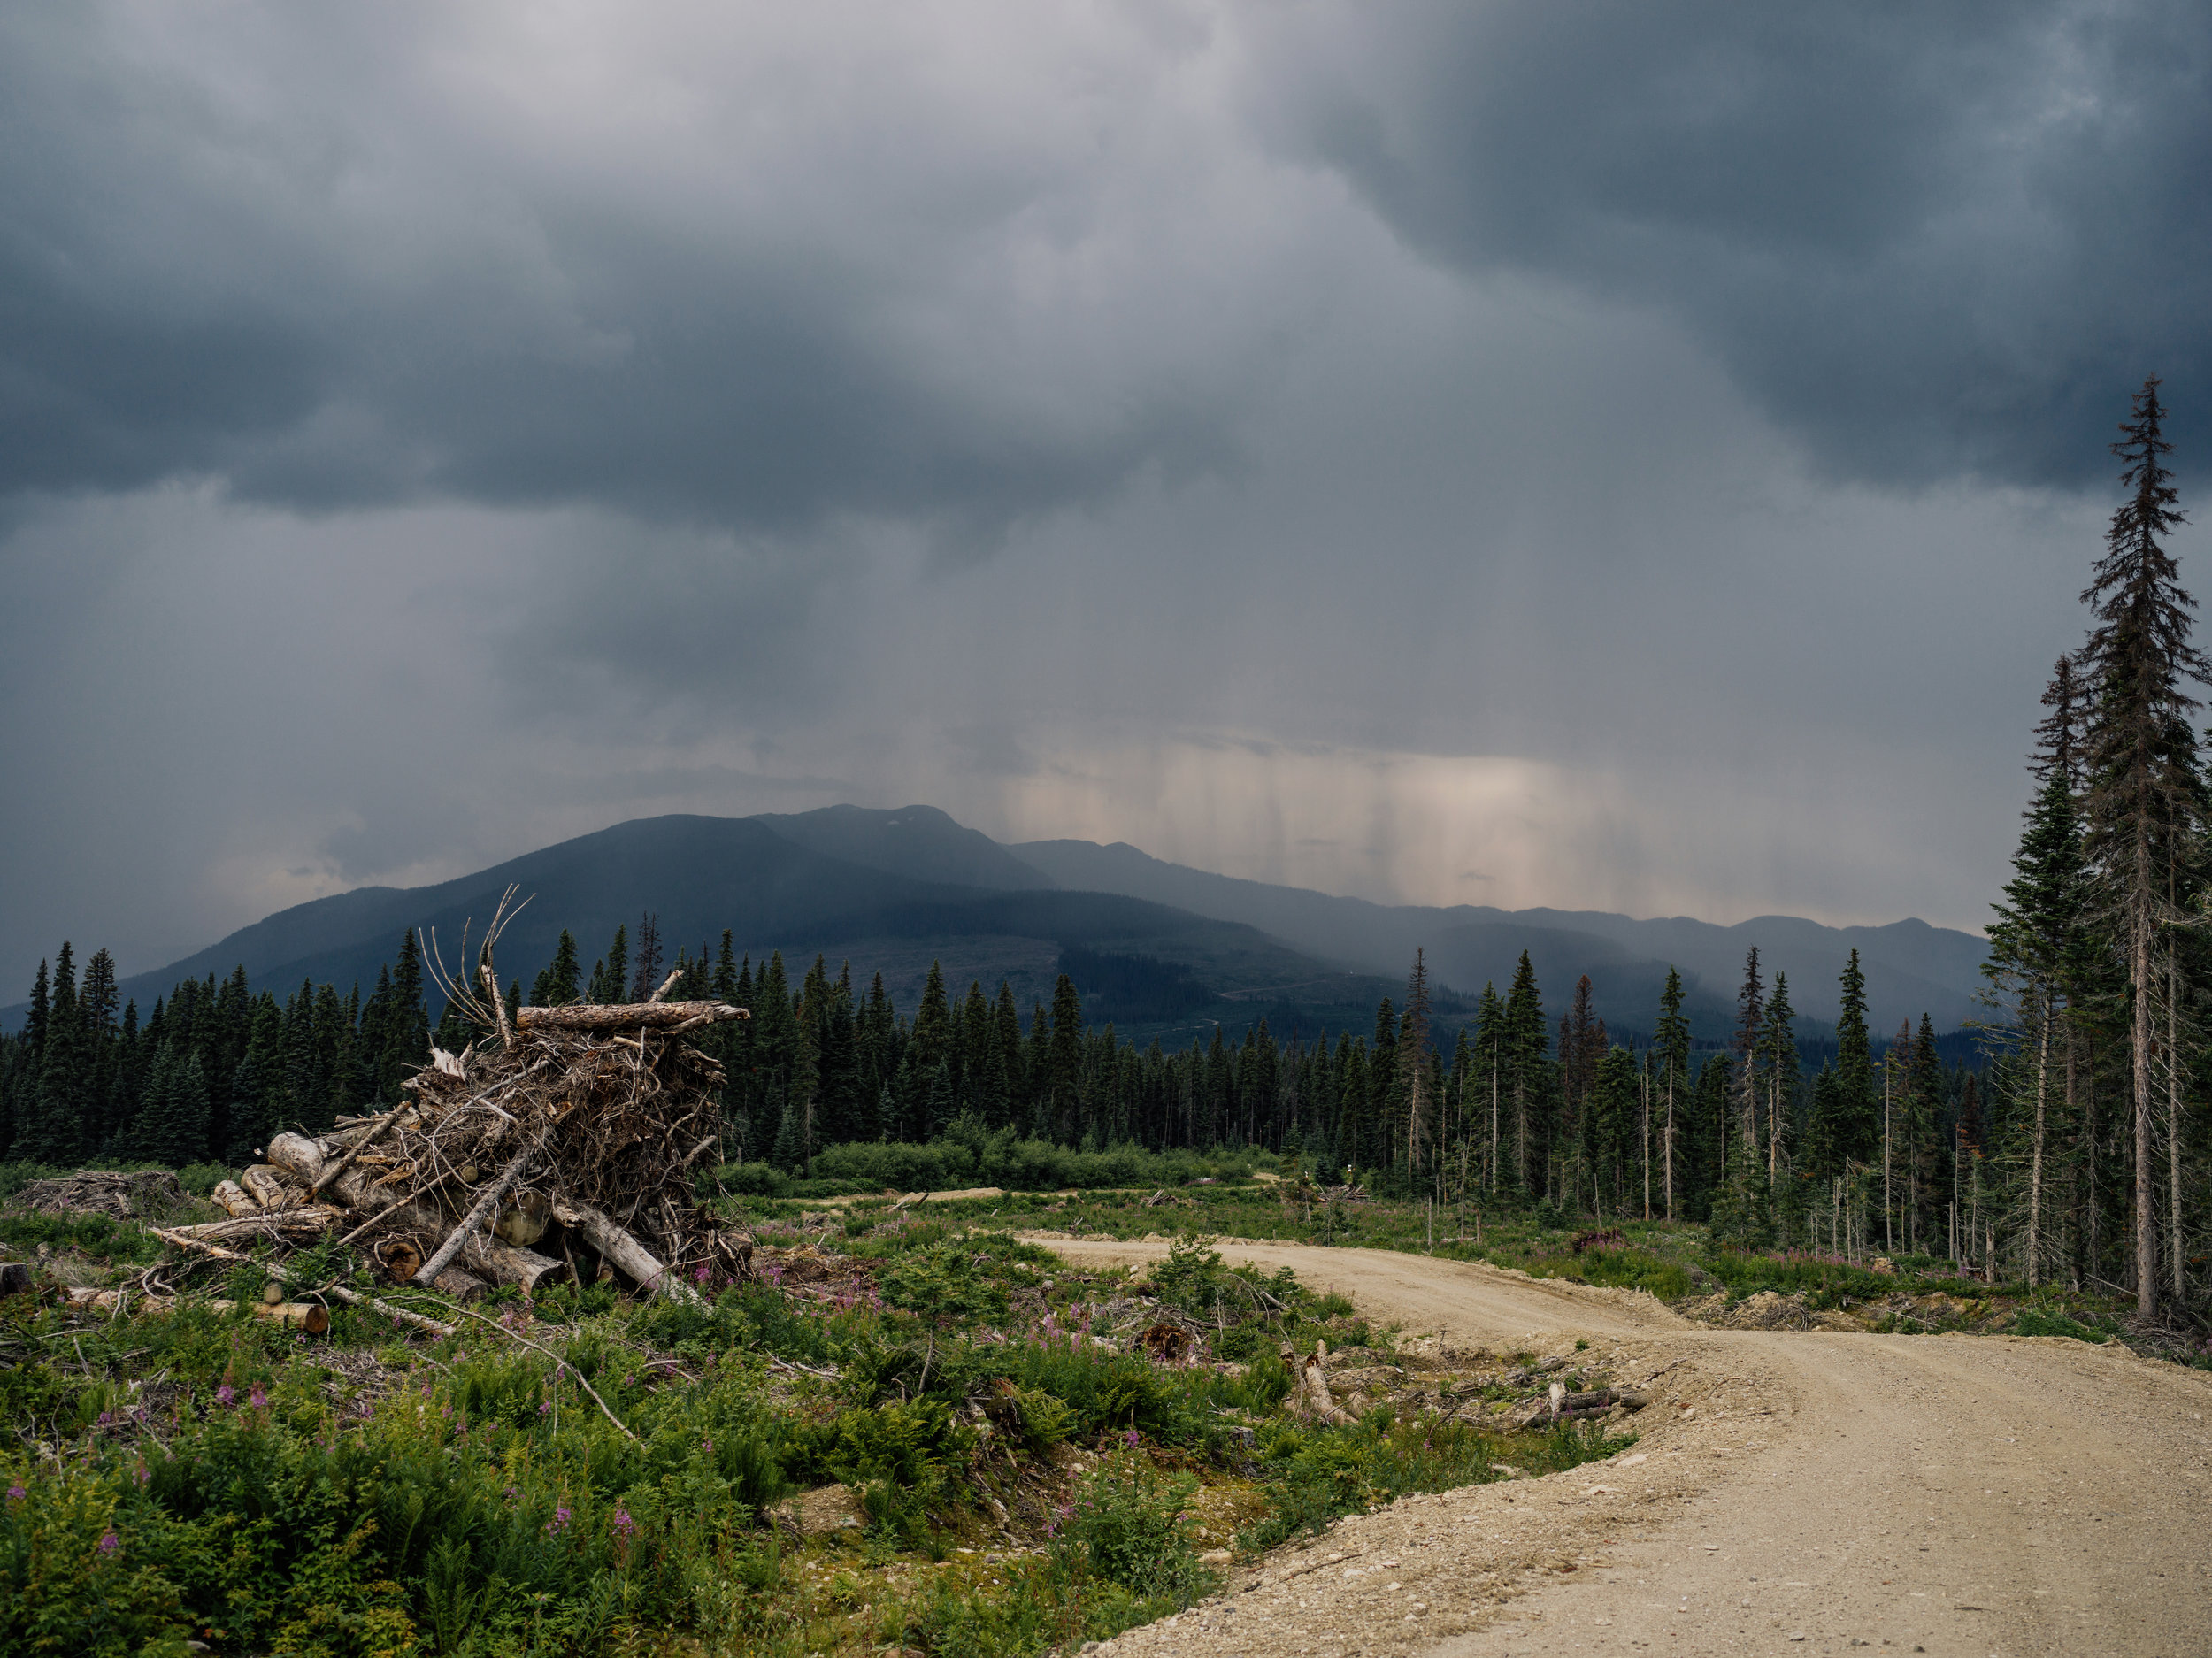 Inland-Temperate-Rainforest-TheNarwhal-0105.JPG